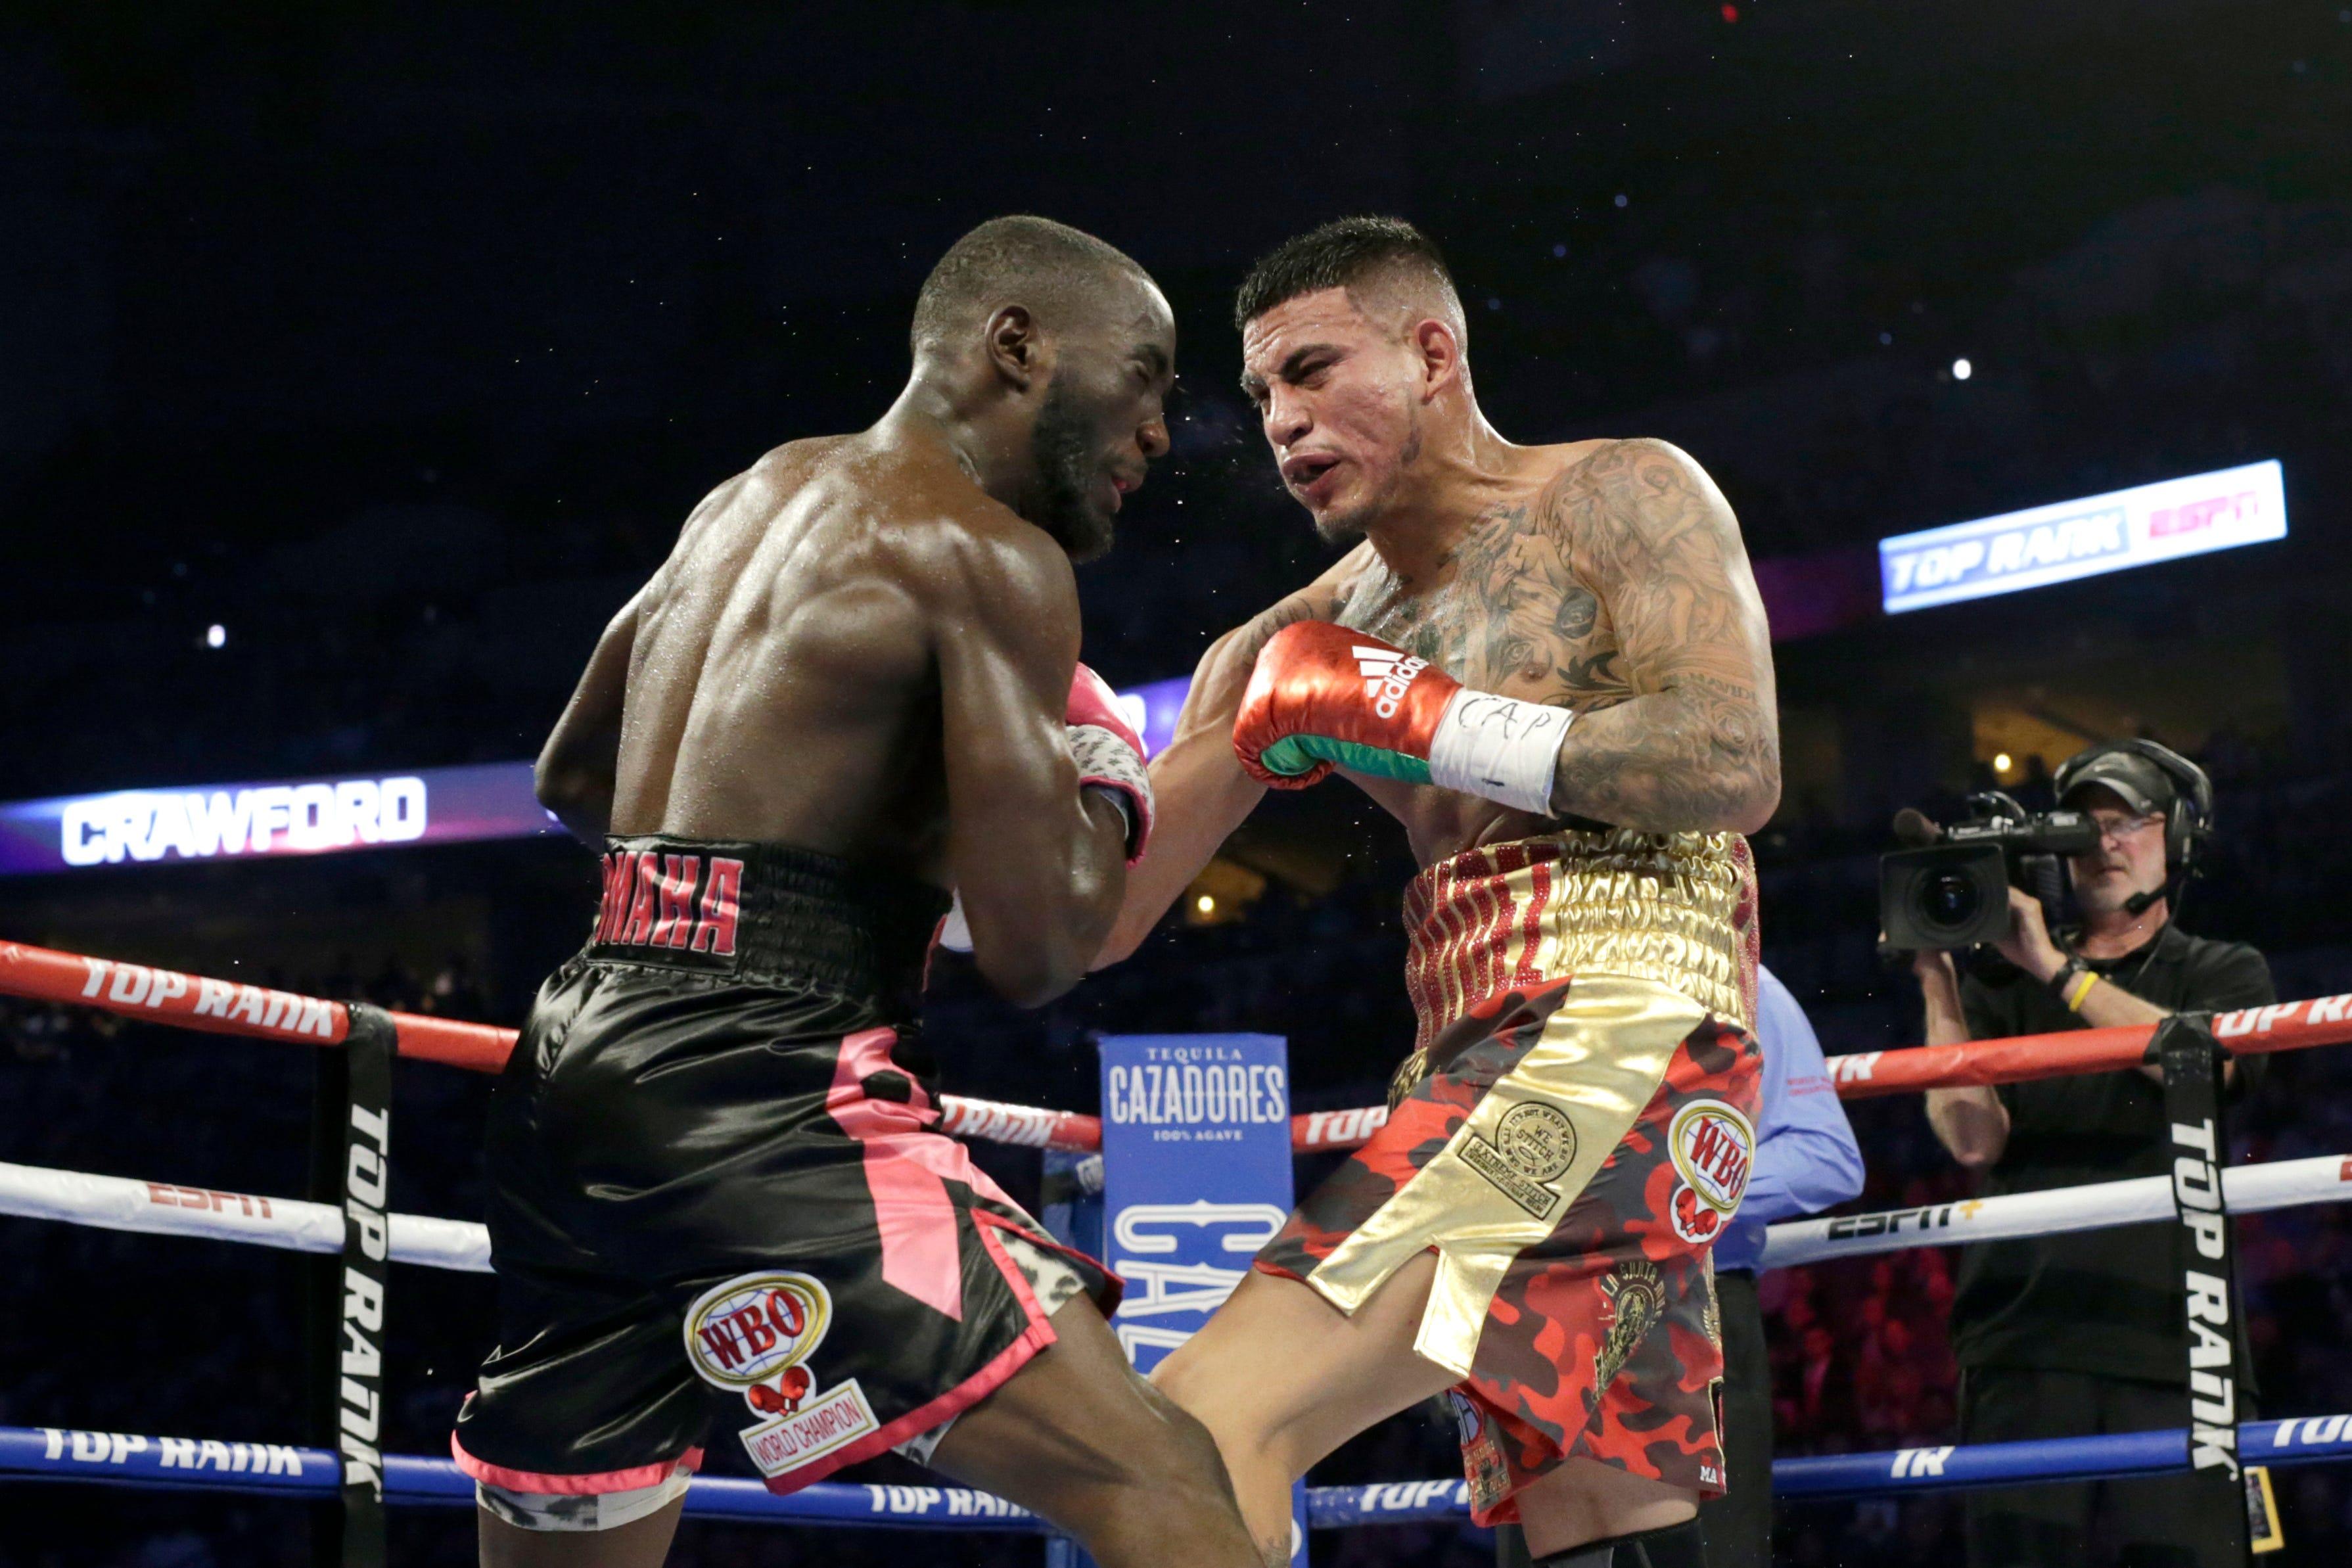 Crawford stops Benavidez late in last round to keep WBO belt